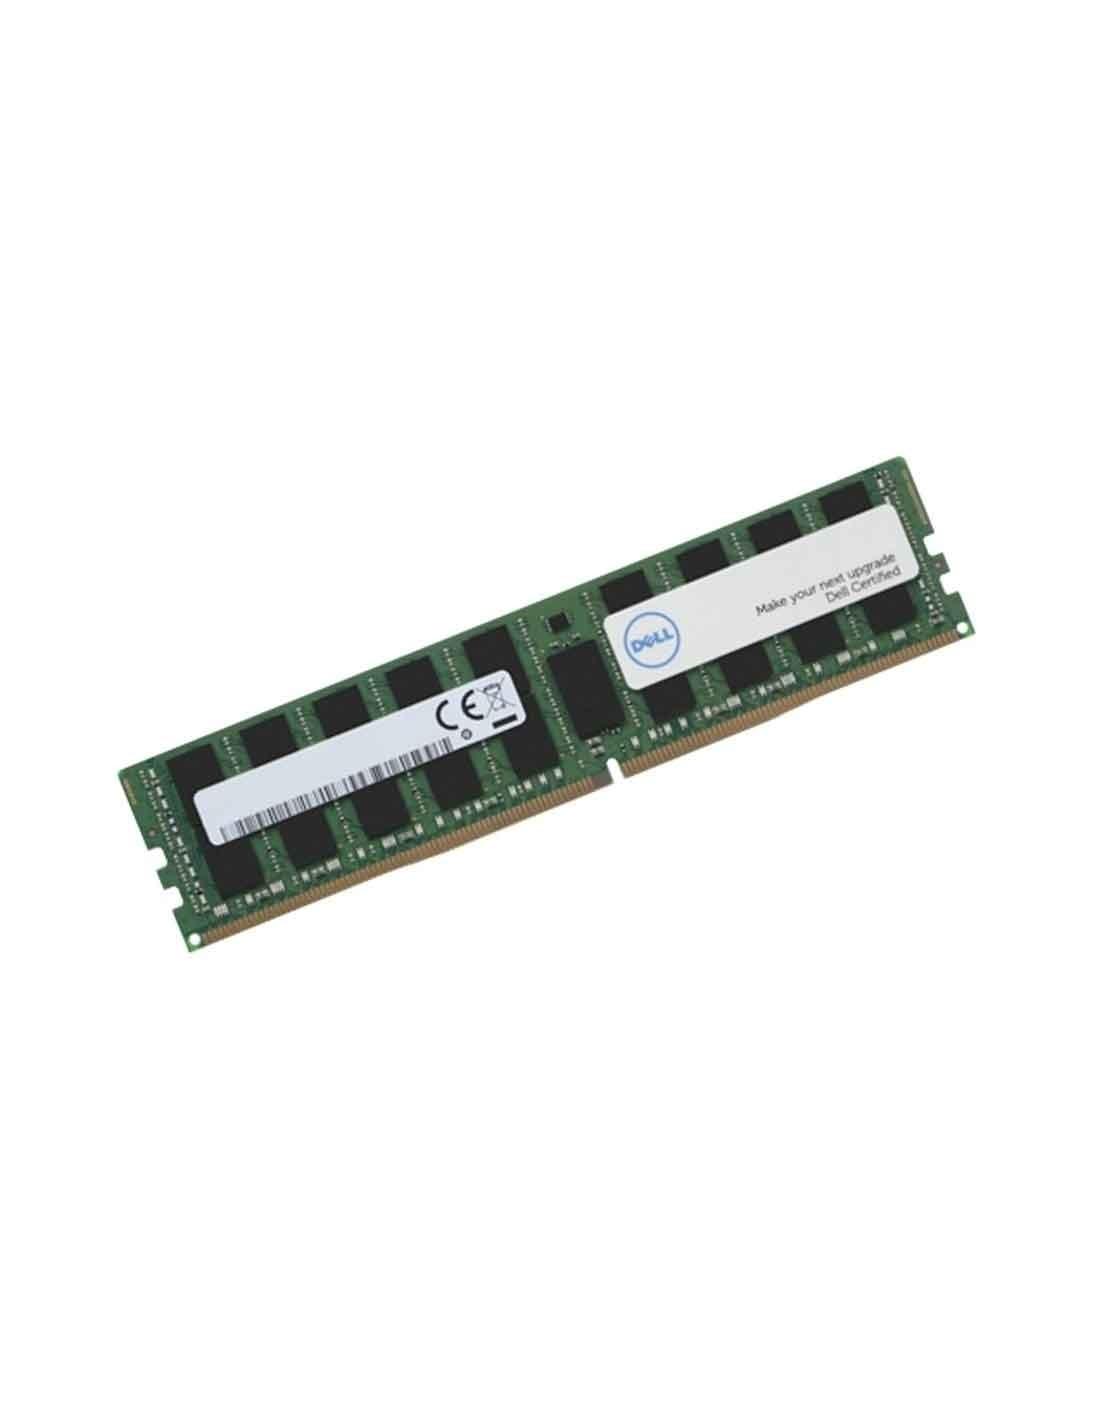 Dell 8 GB PC4-2400R-17 1RX8 288P at a cheap price in Dubai Online Store